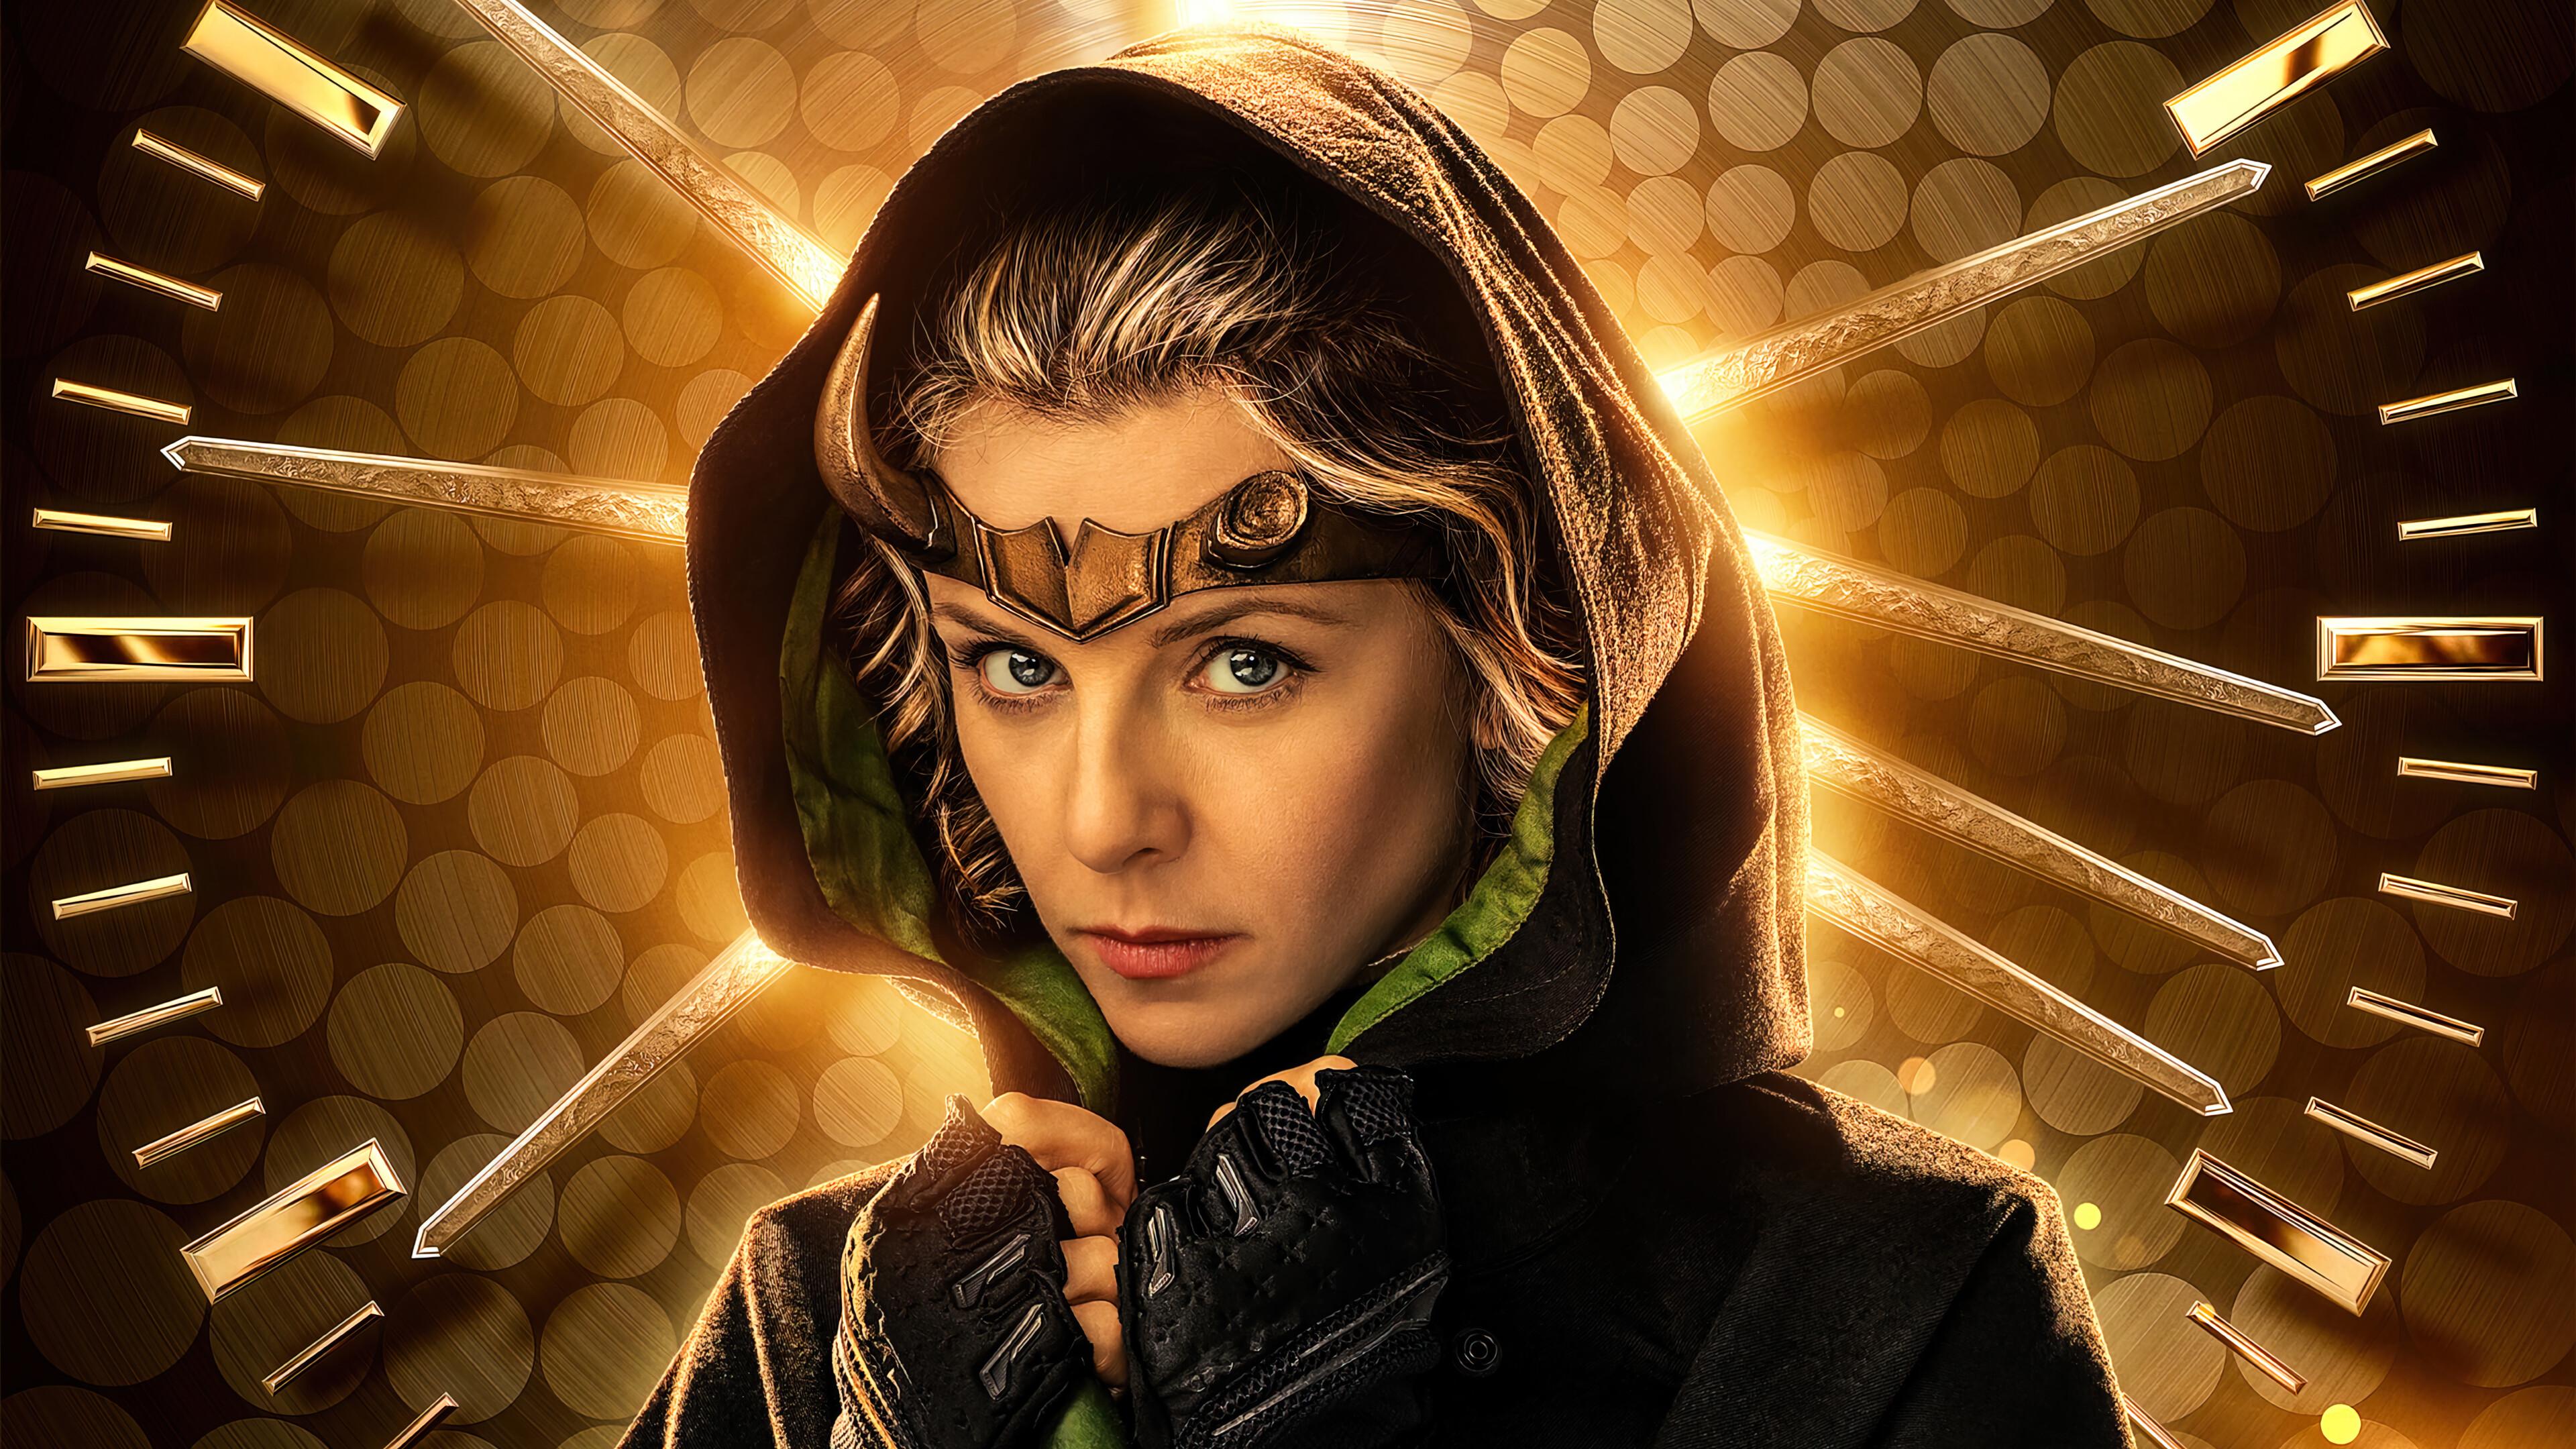 Loki TV Series Sylvie 4K Phone iPhone Wallpaper 8020a 3840x2160